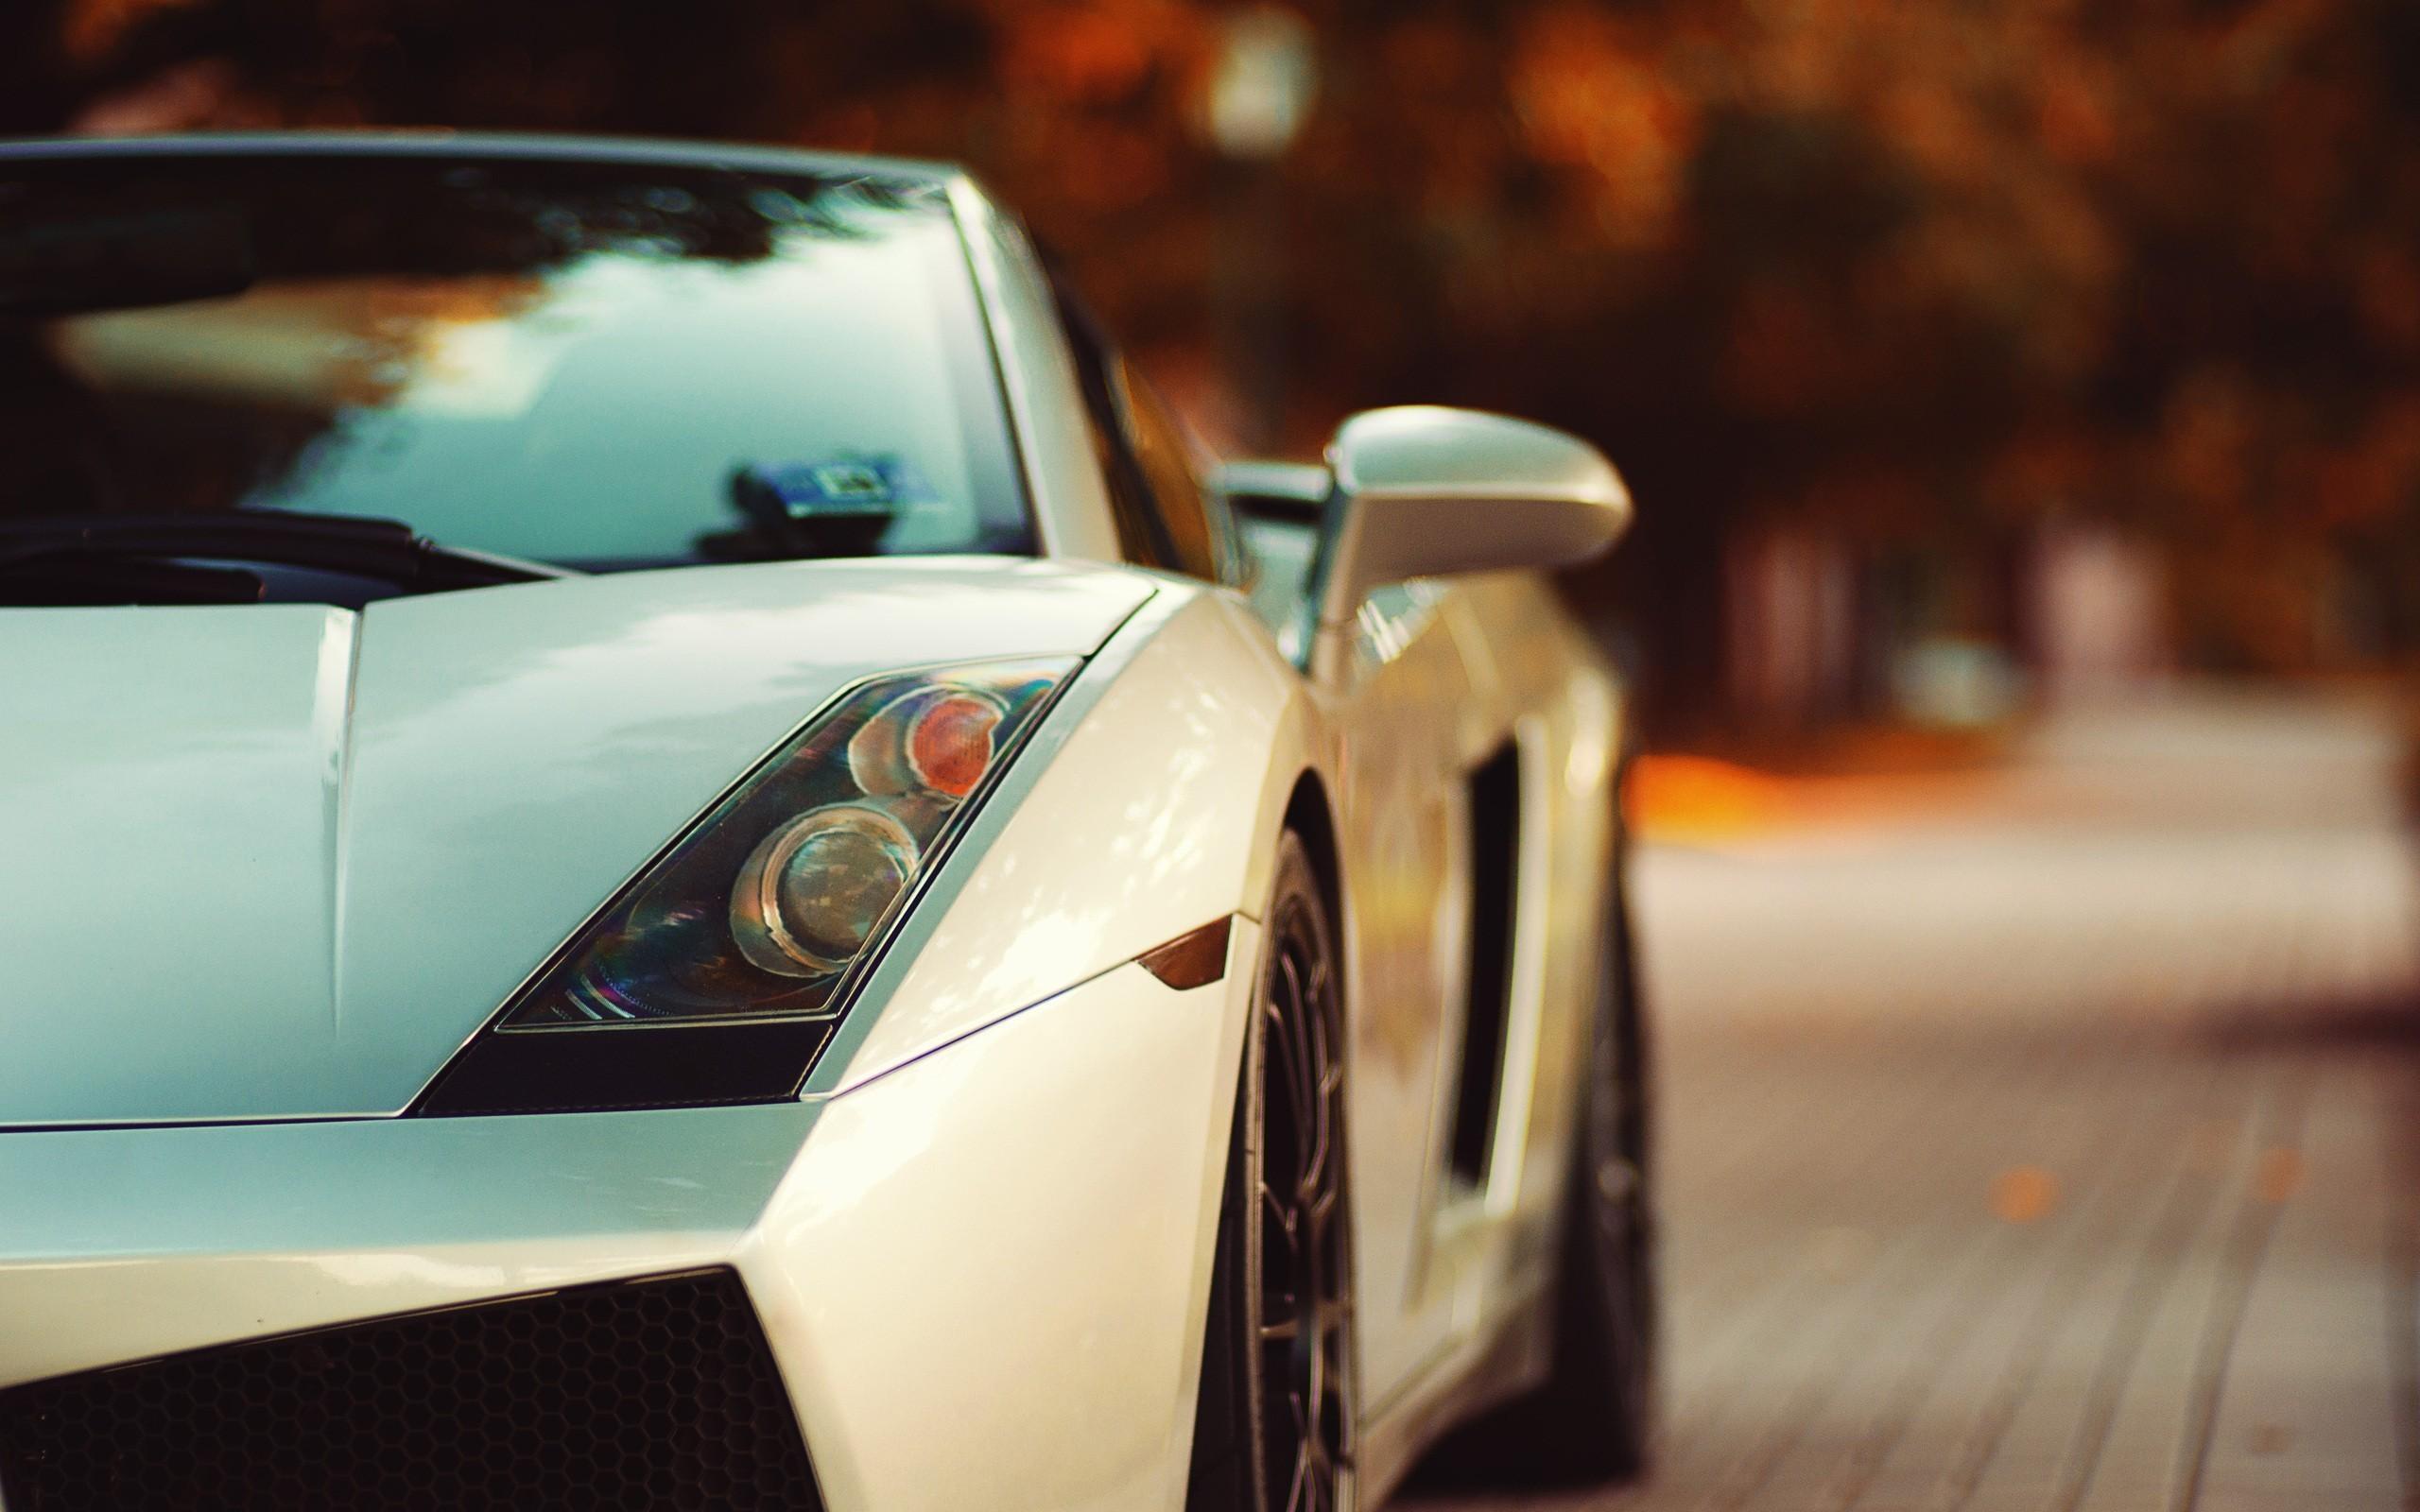 Lamborghini Super Car Wallpaper | HD Car Wallpapers | ID #2629